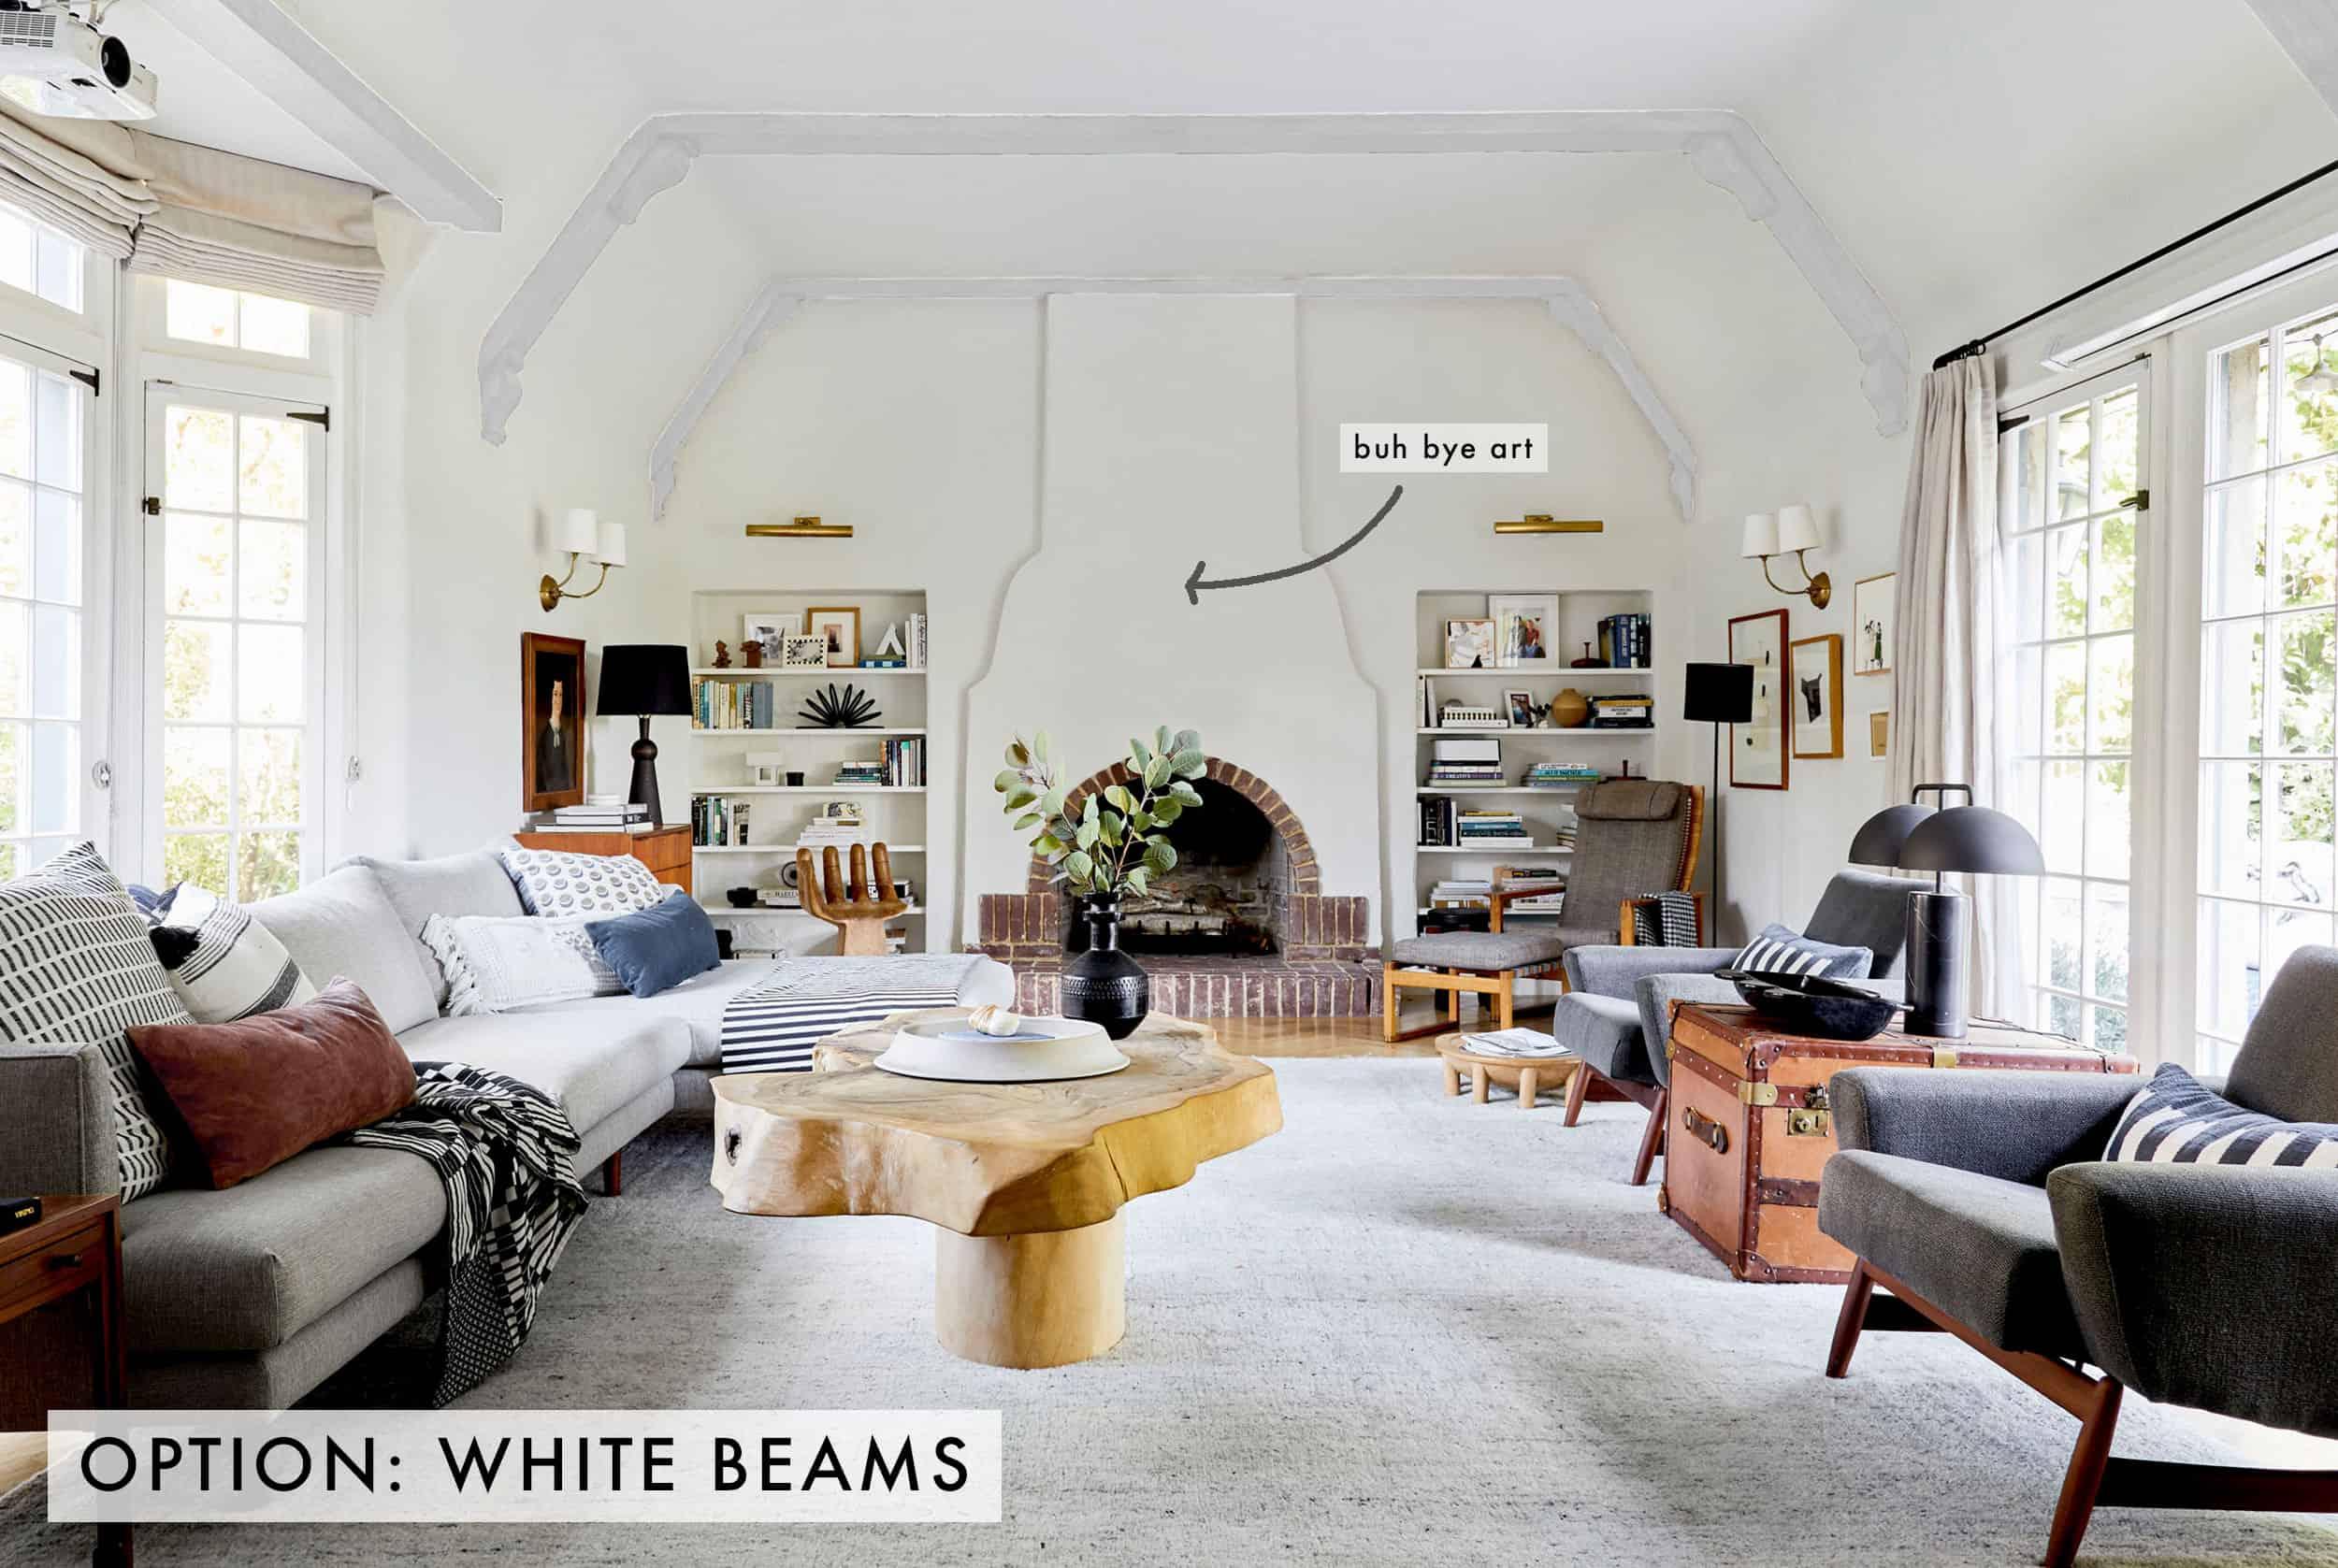 White Beams No Art